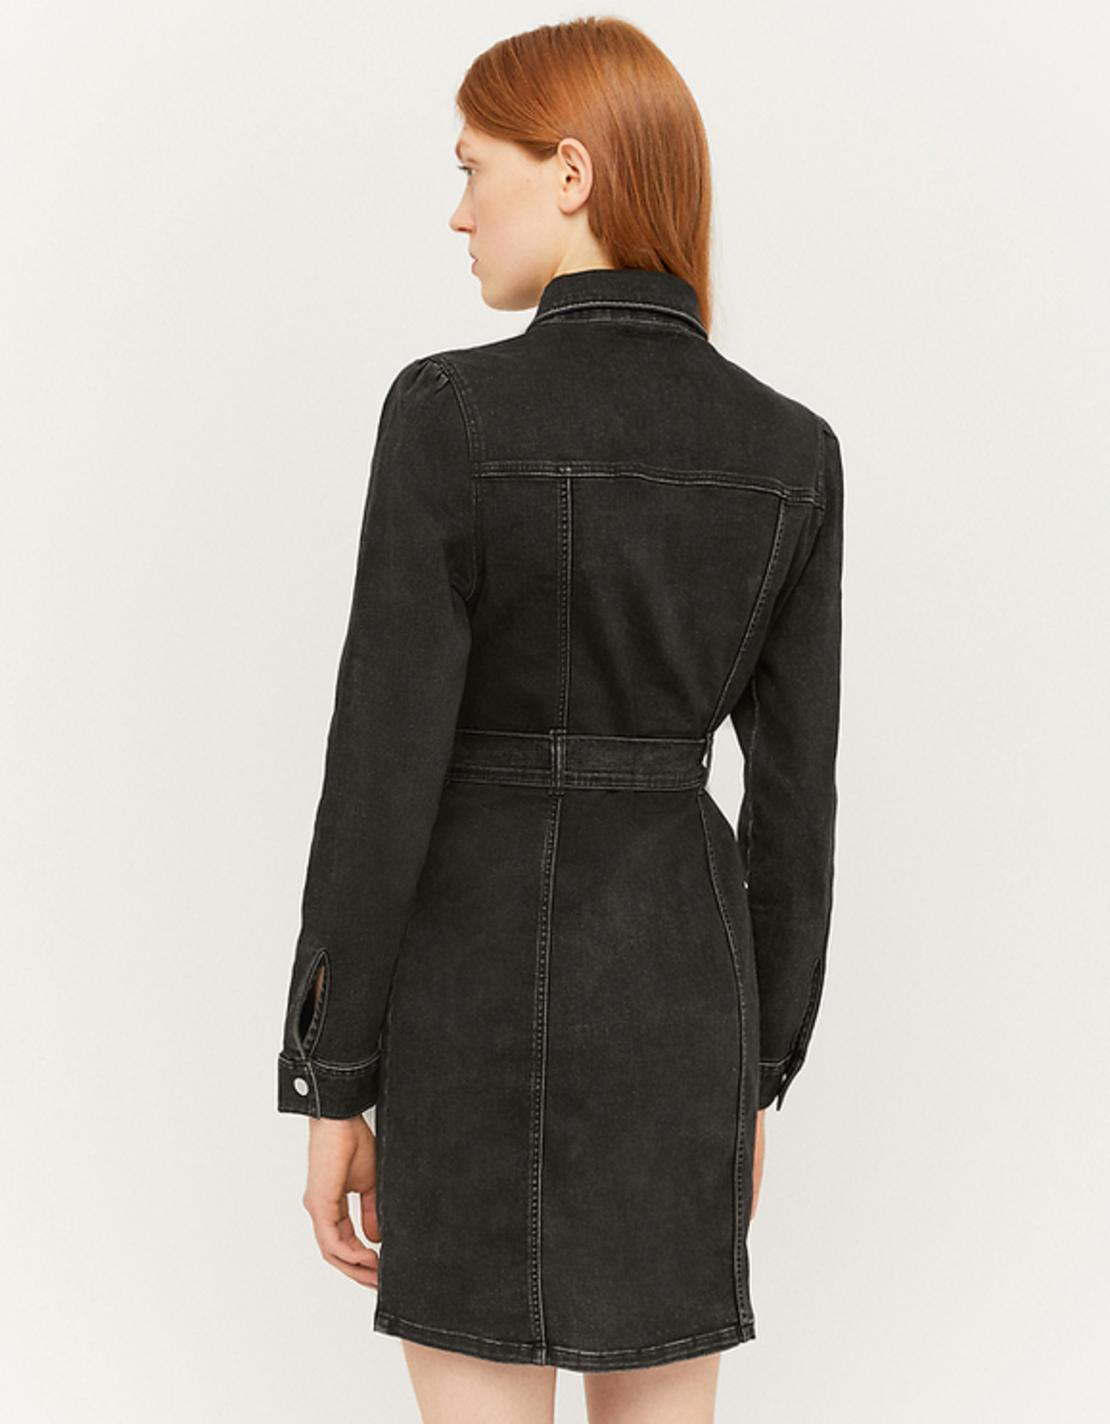 SDRDEGRACE-HHU BLK006 שמלת ג'ינס לייקרה כפתורים וחגורה